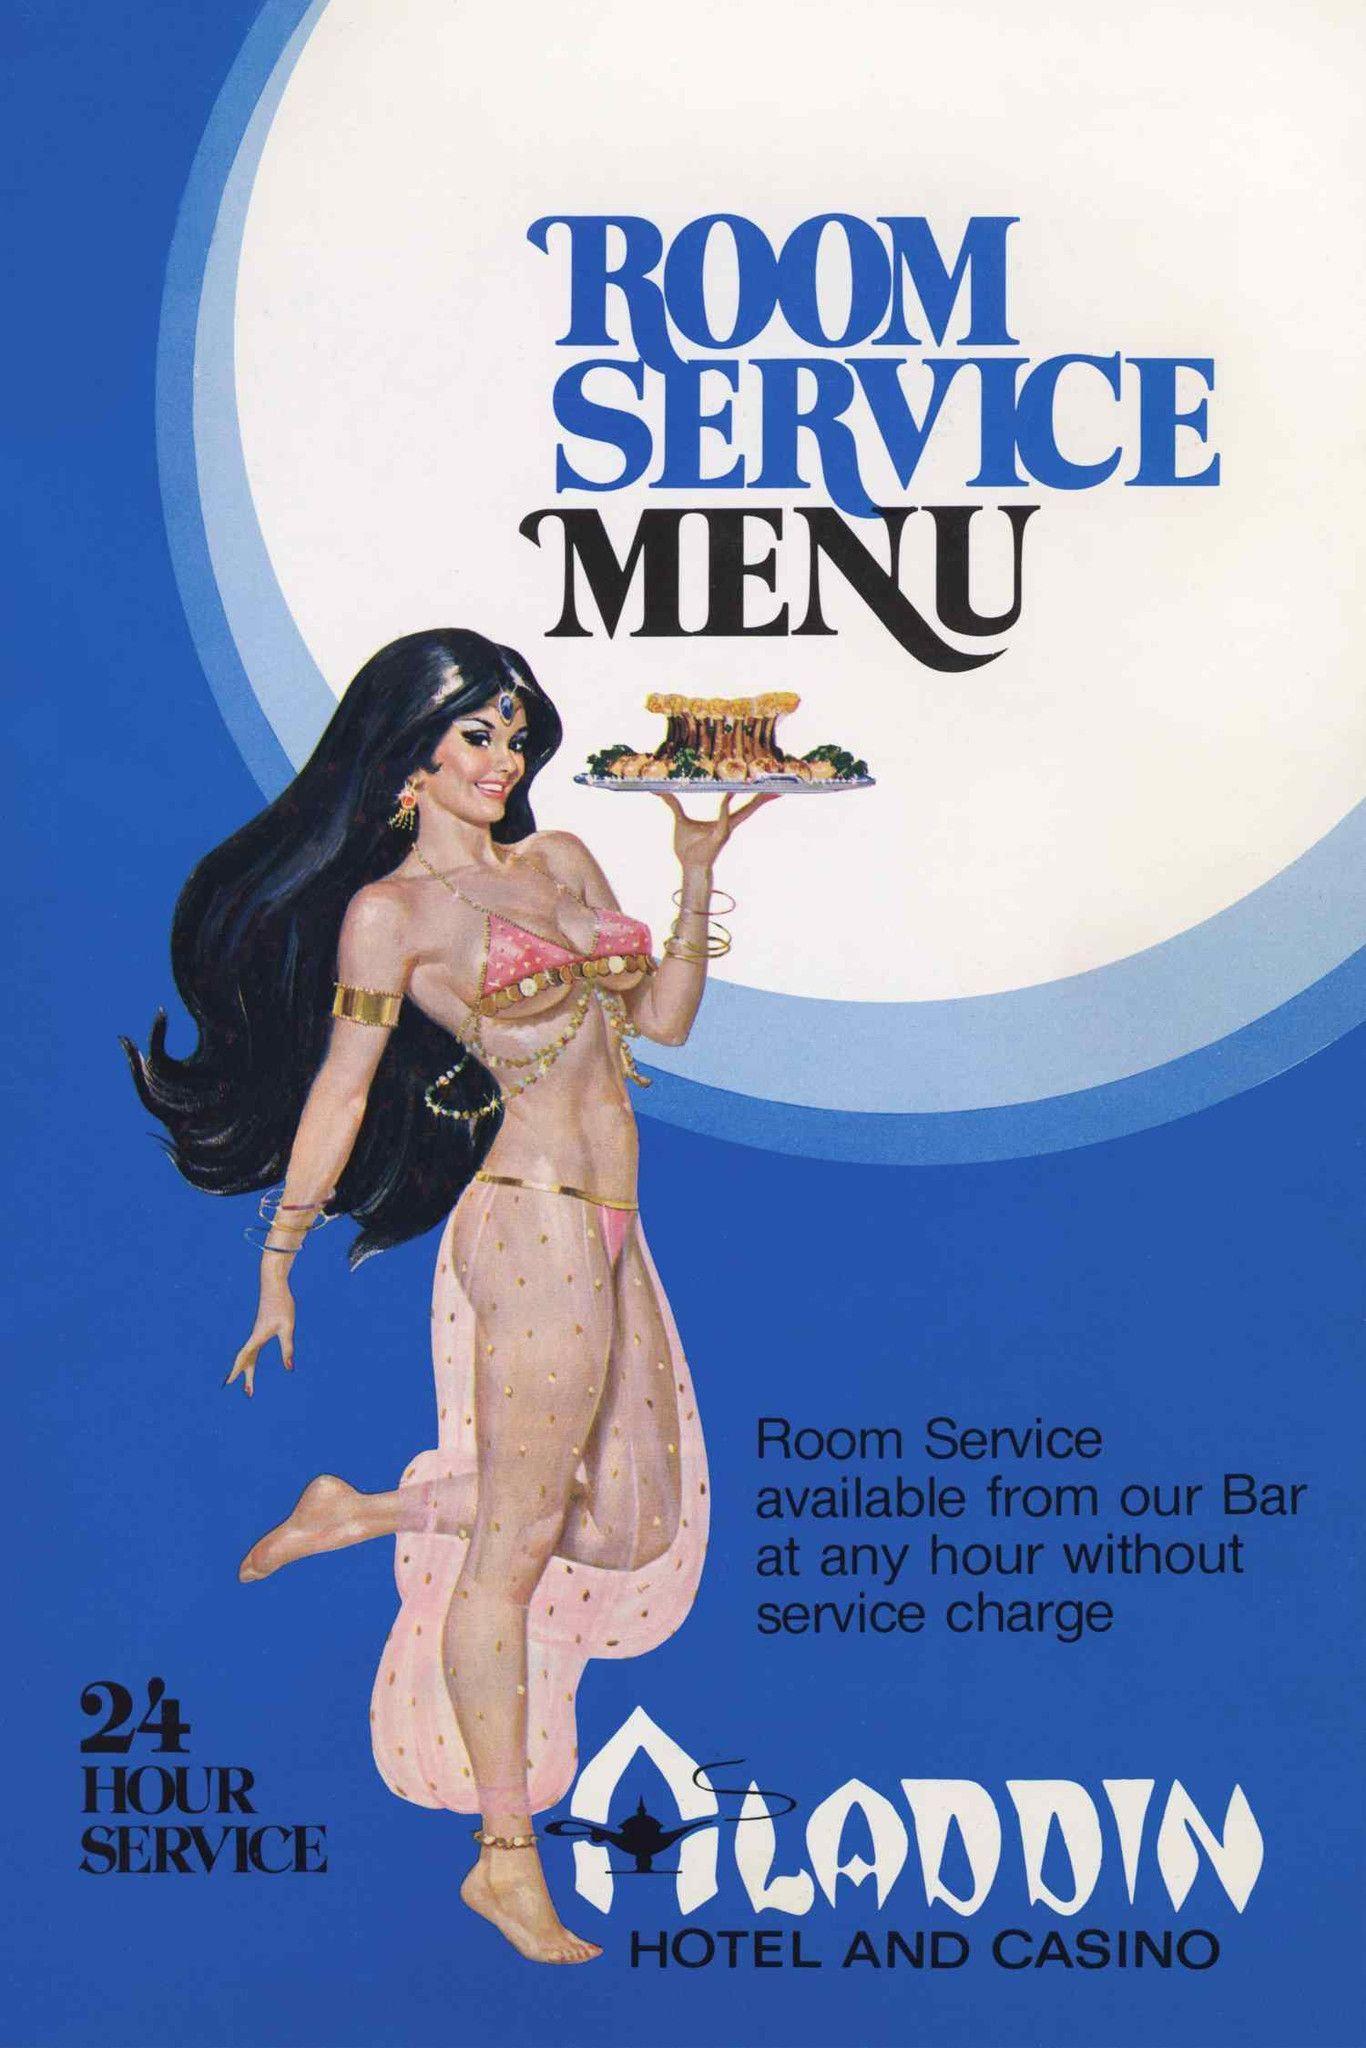 Aladdin hotel and casino room service menu cool culinaria